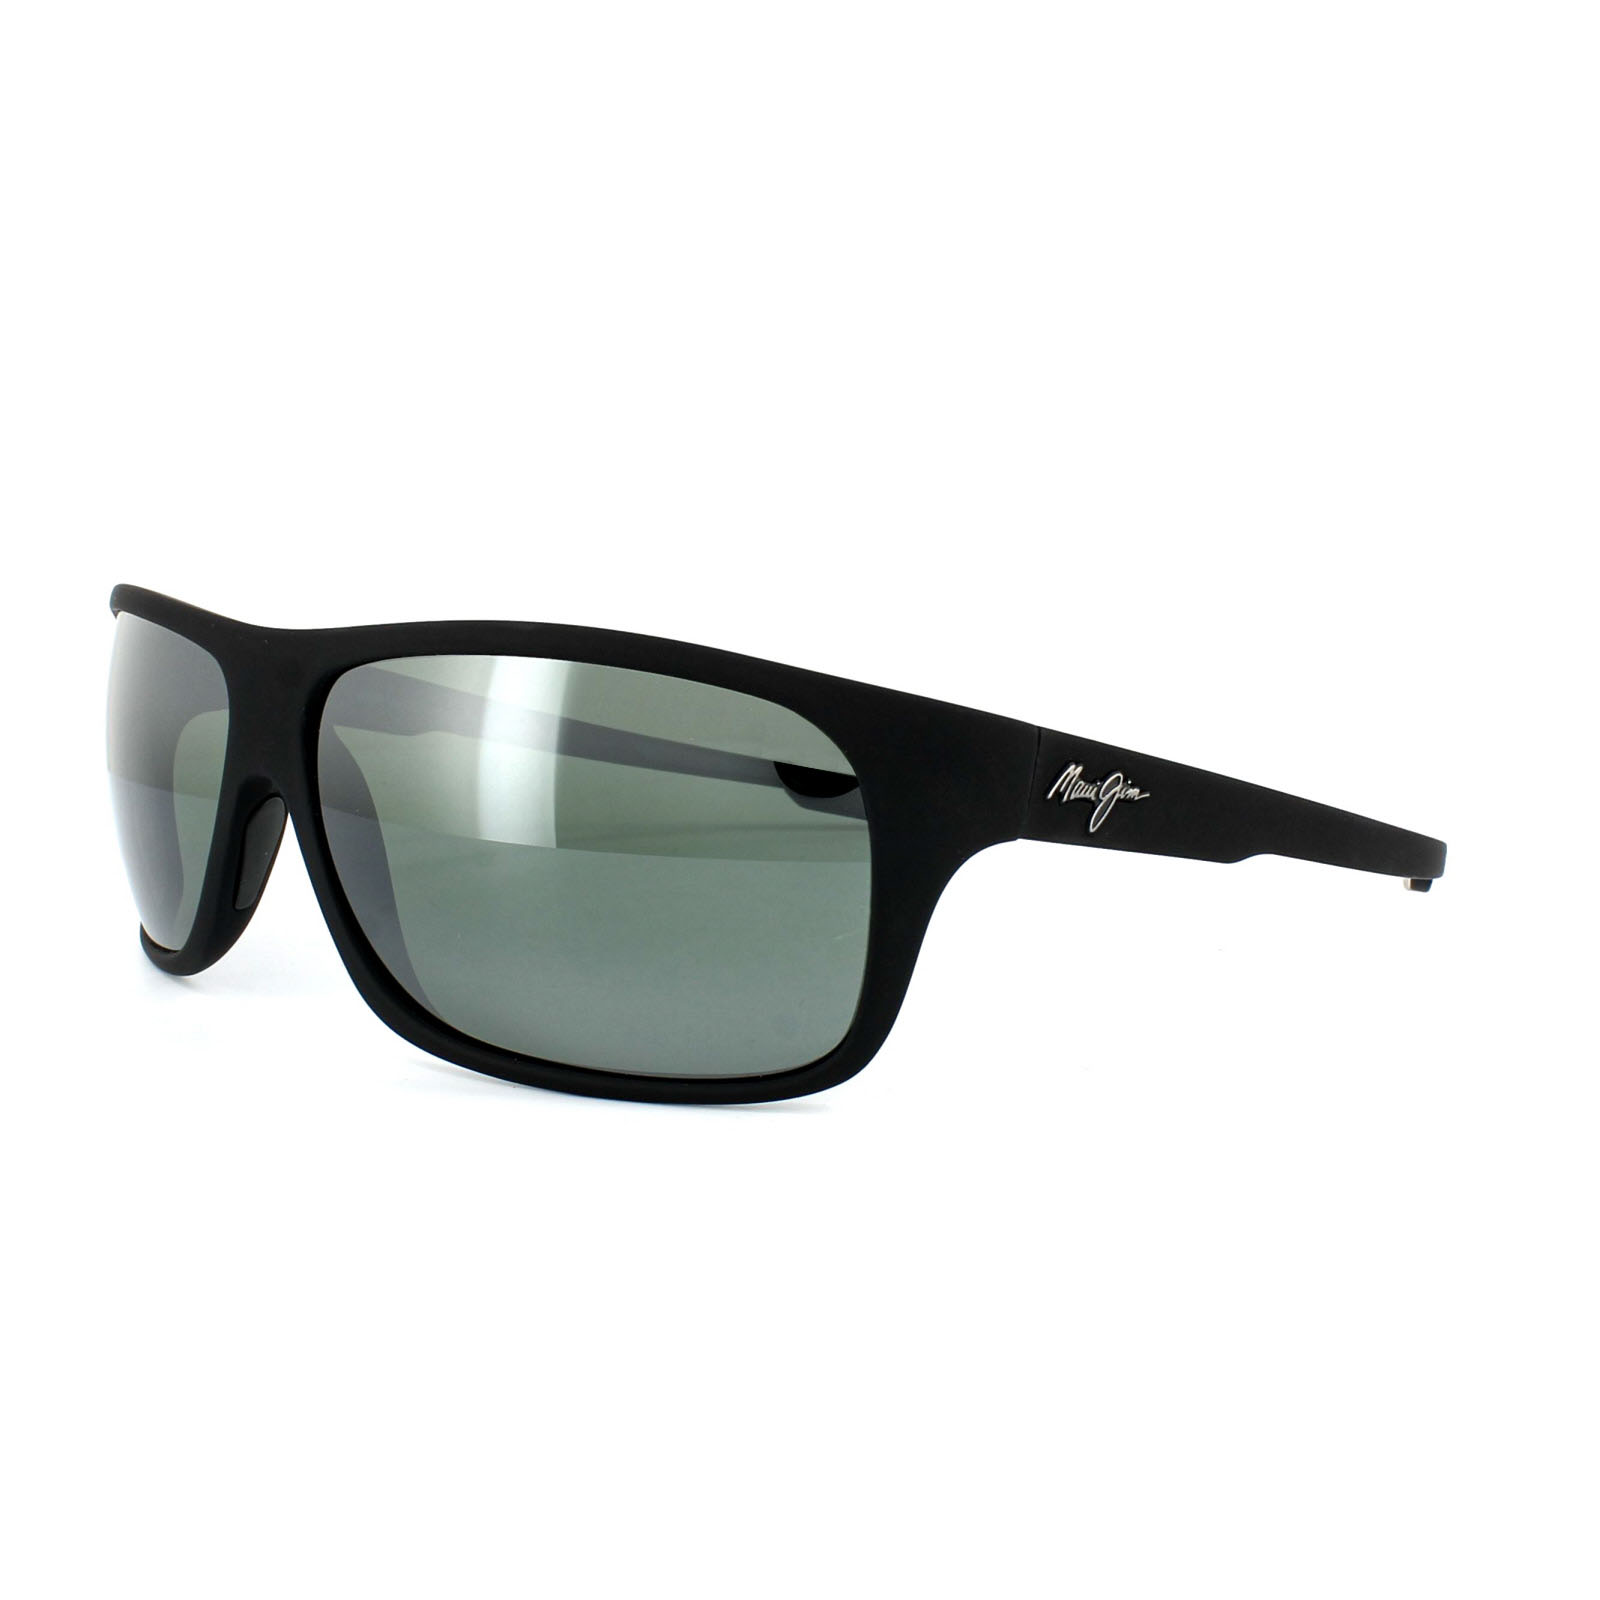 Cheap Maui Jim Island Time Sunglasses Discounted Sunglasses